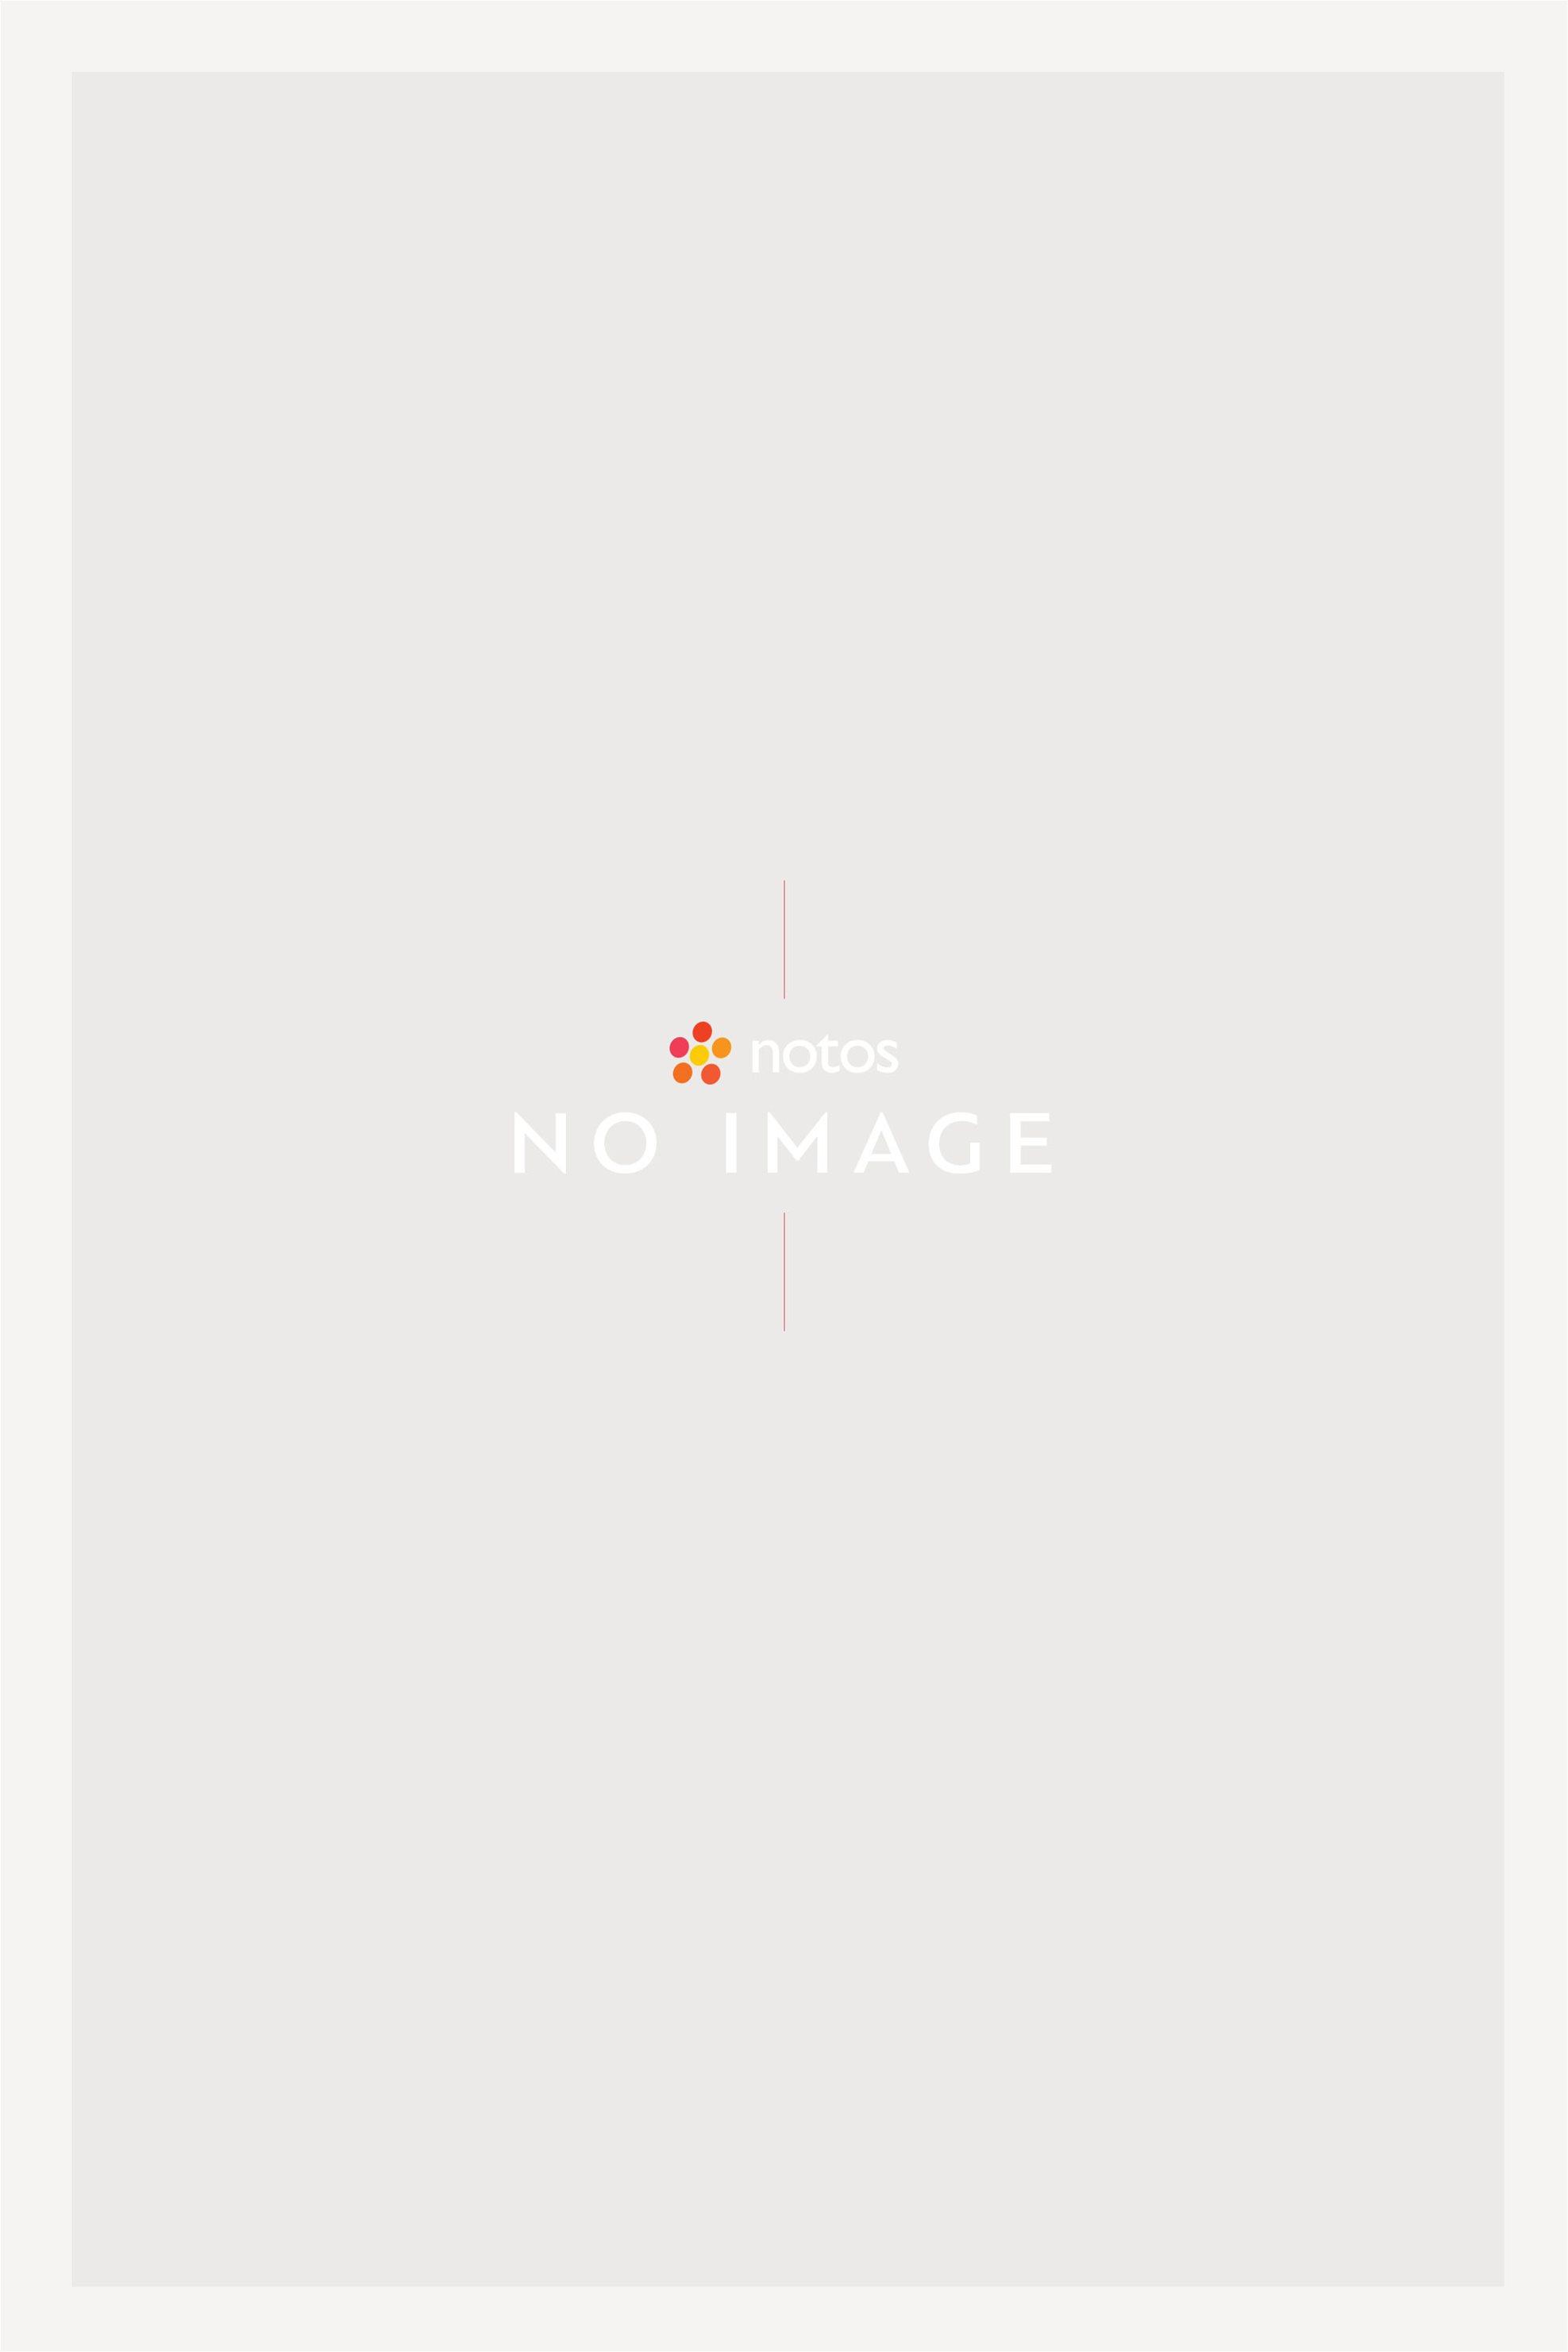 Lacoste ανδρική μπλούζα Polo L.12.12 με μακρύ μανίκι - L1312 - Ανθρακί ανδρασ   ρουχα    νεεσ αφιξεισ   μπλούζες   πόλο